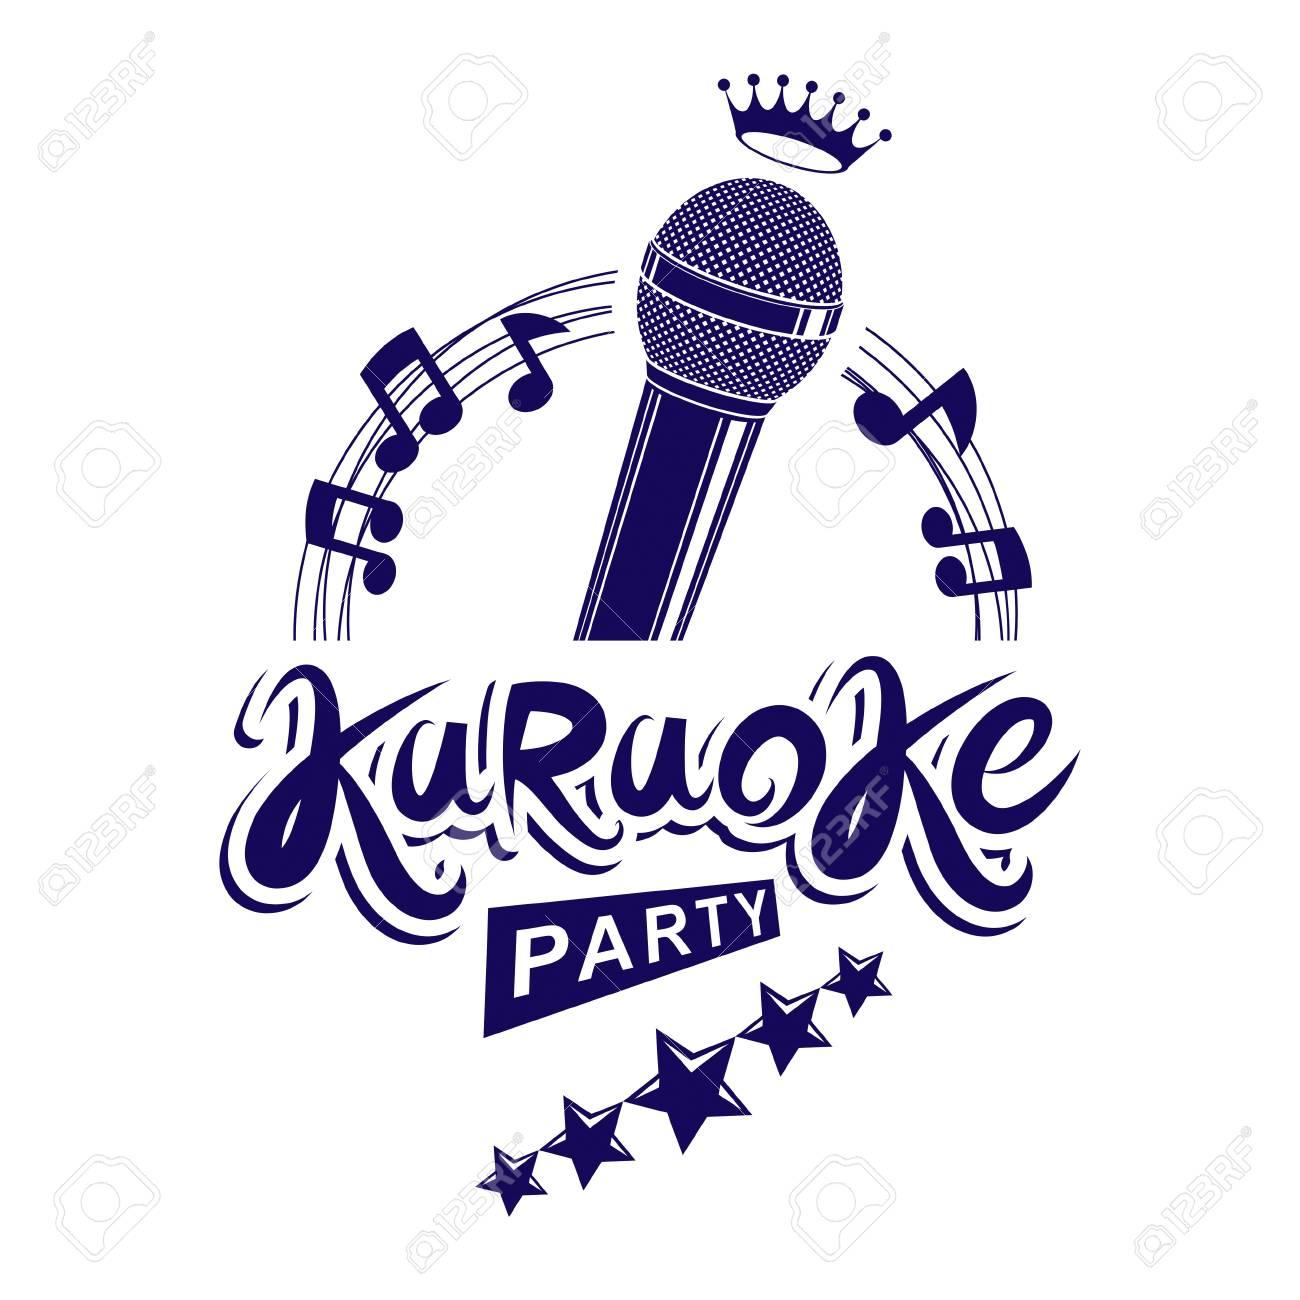 Karaoke Party Invitation Poster. Royalty Free Cliparts, Vectors ...